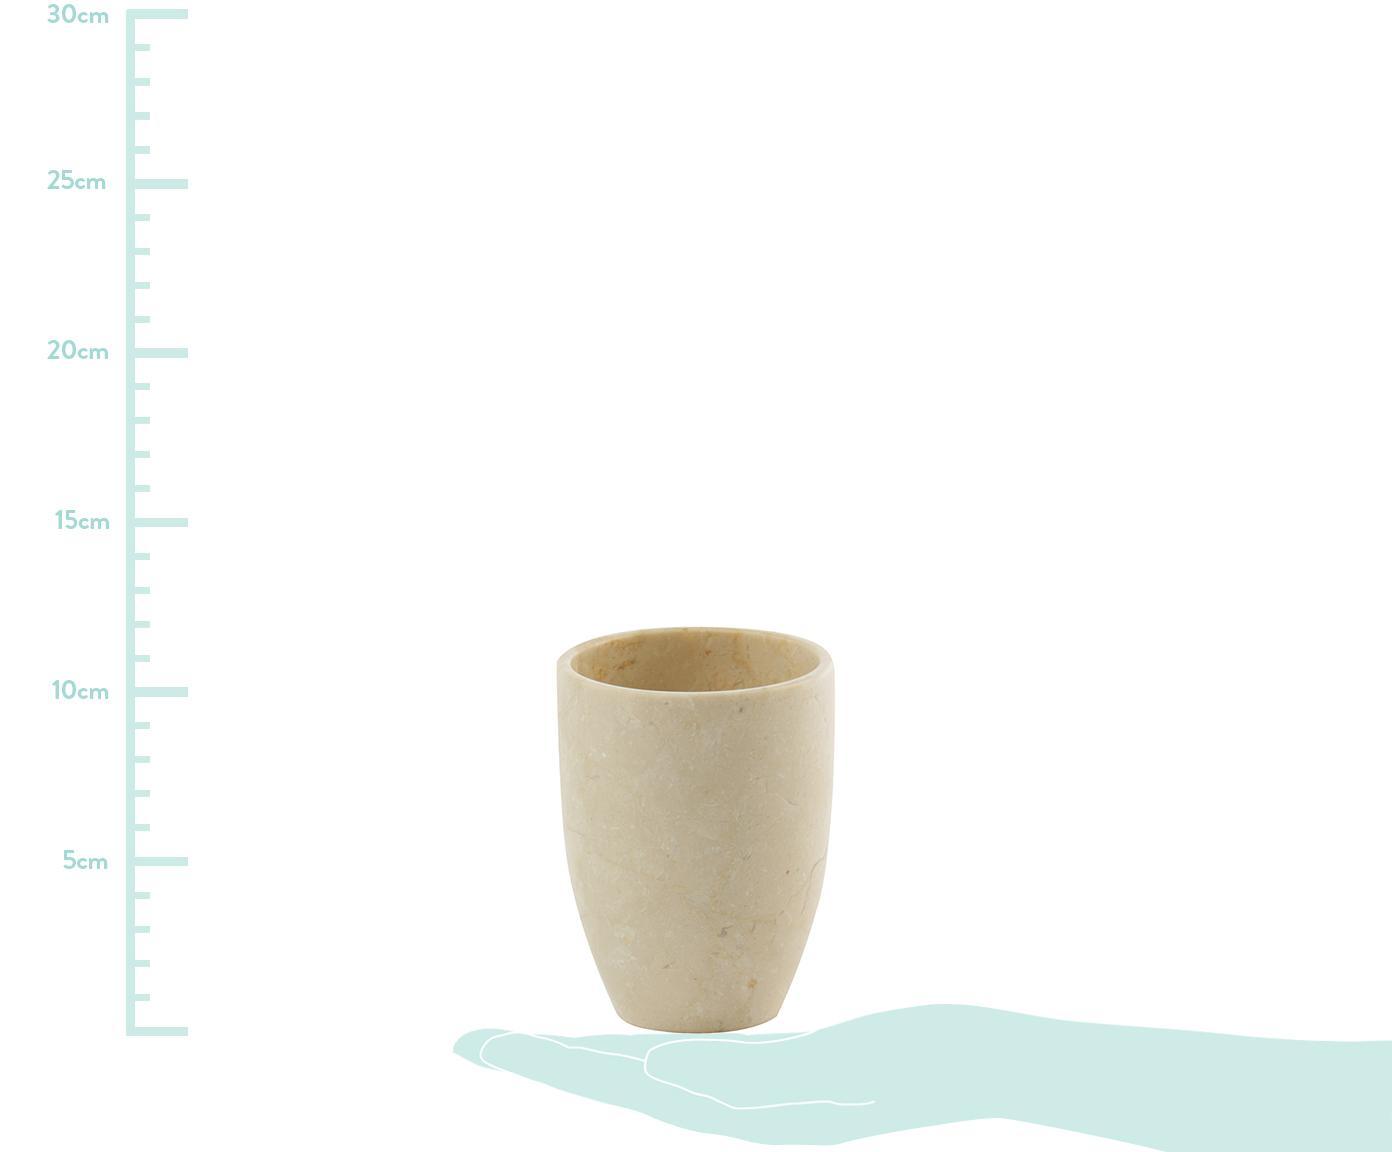 Marmor-Zahnputzbecher Luxor, Marmor, Beige, Ø 8 x H 10 cm